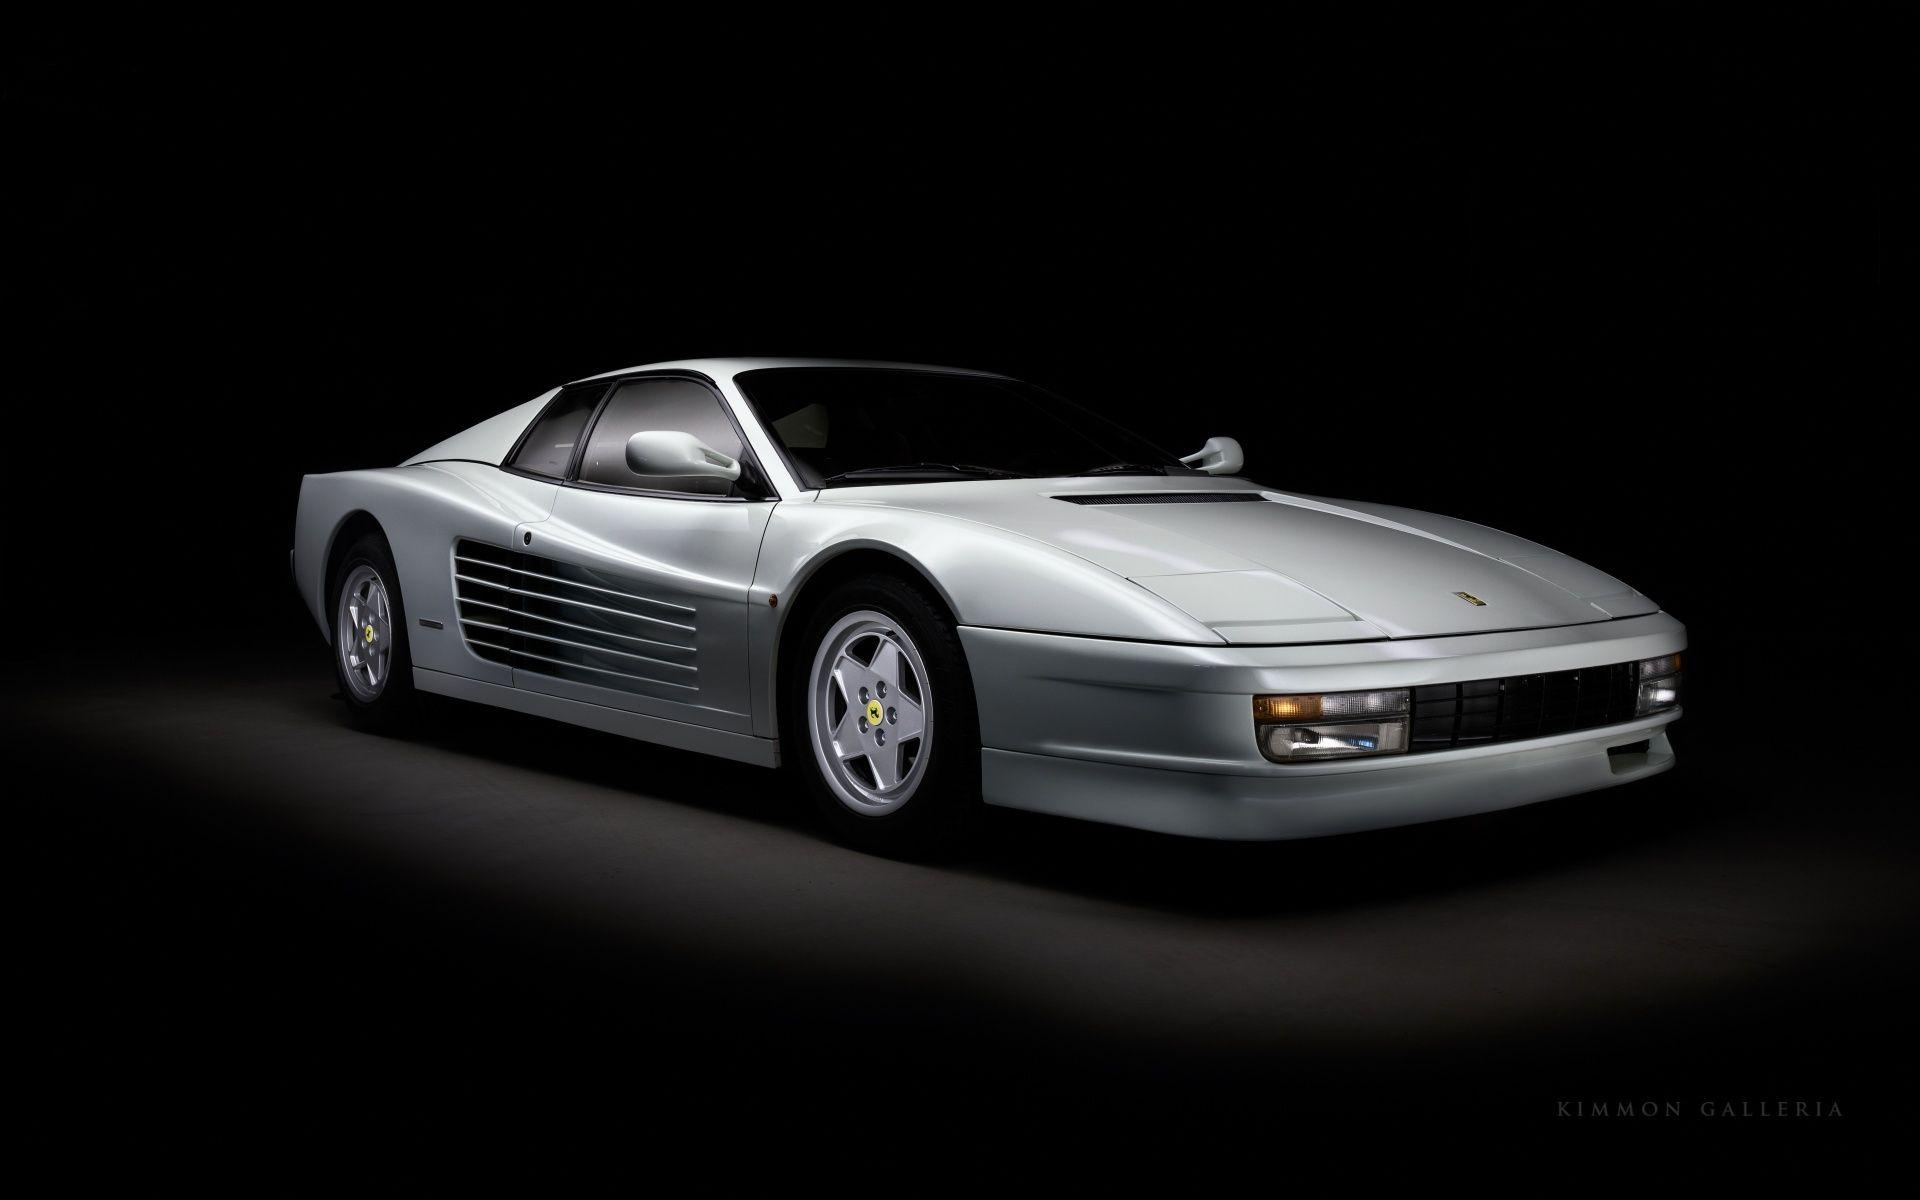 1990 Ferrari Testarossa Classic Driver Market Lexus Cars